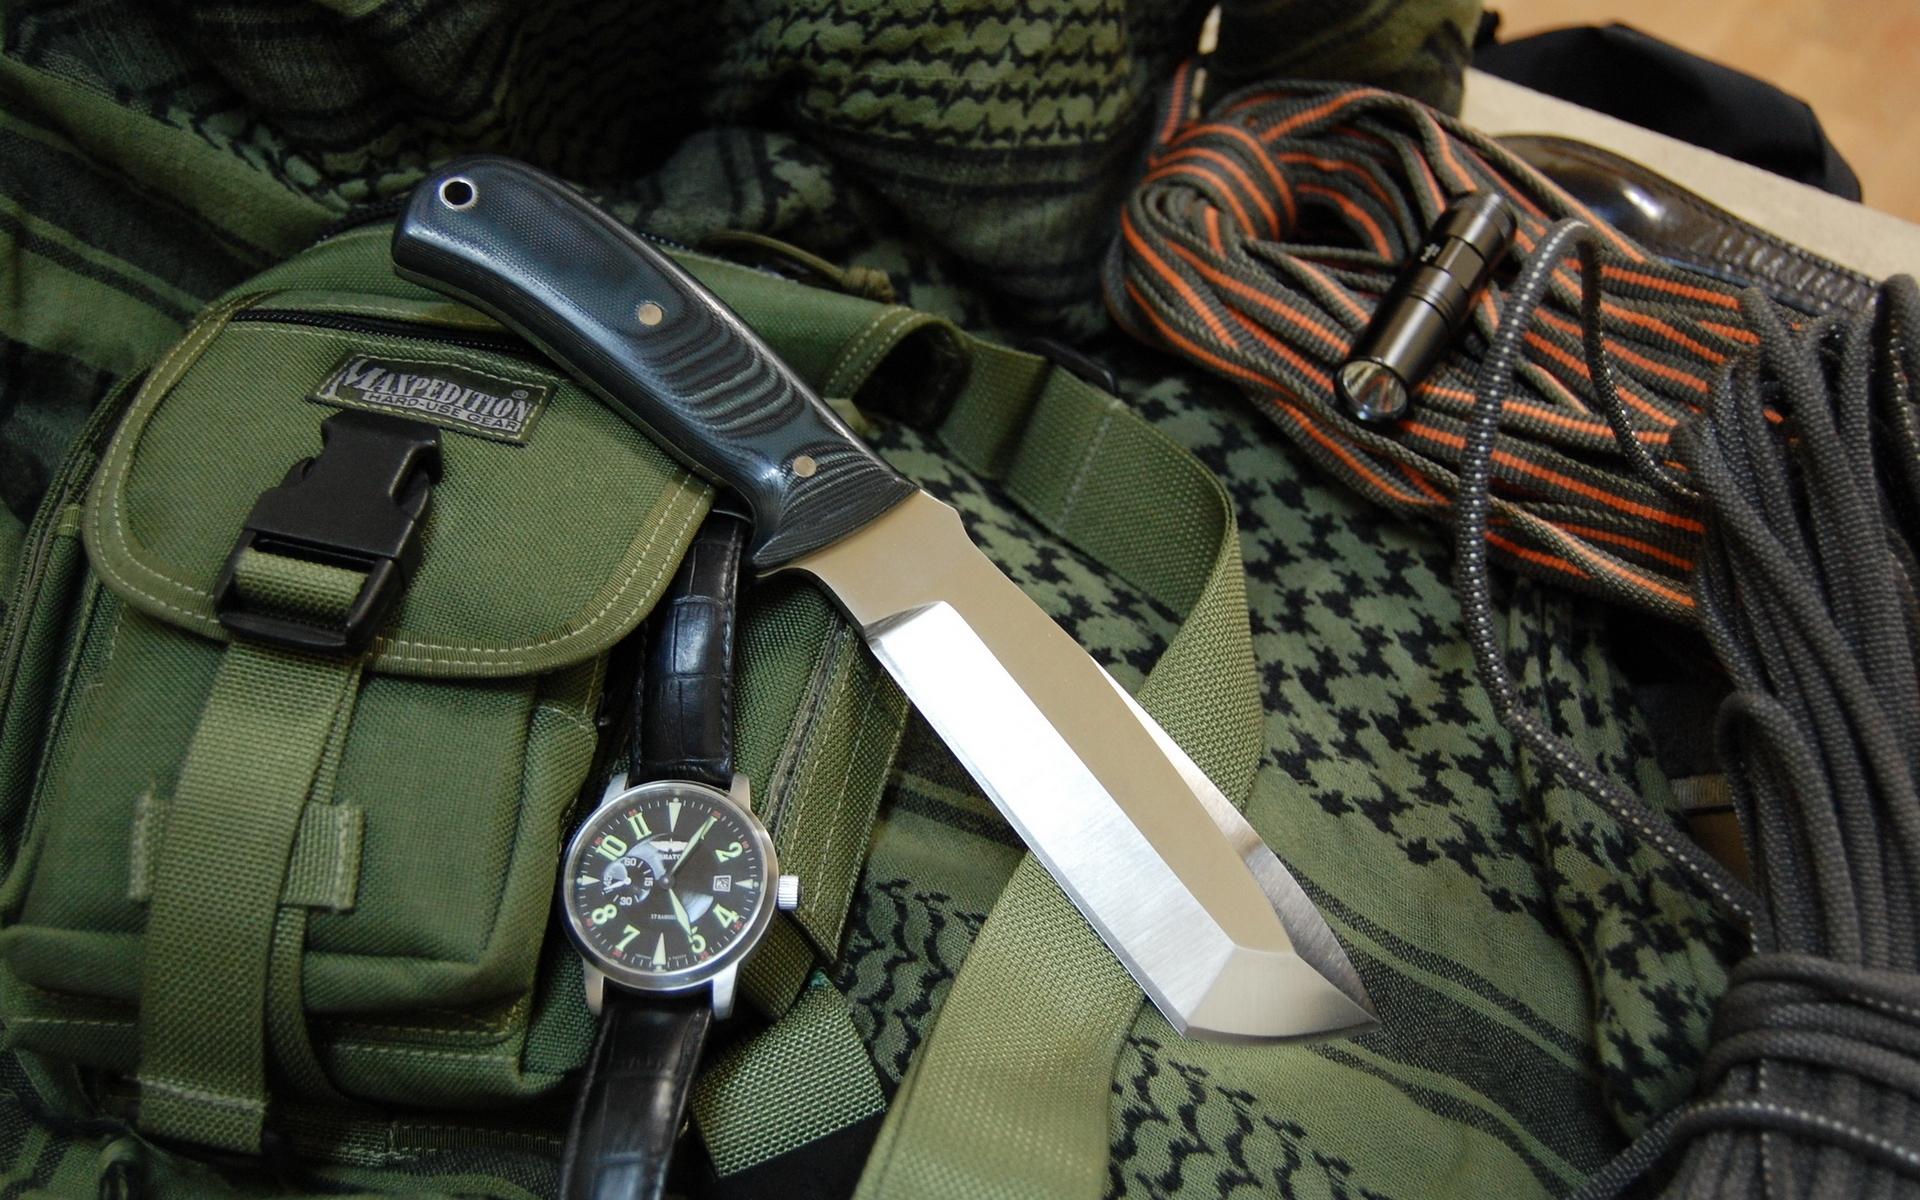 Нож с зажигалкой  № 612909 без смс